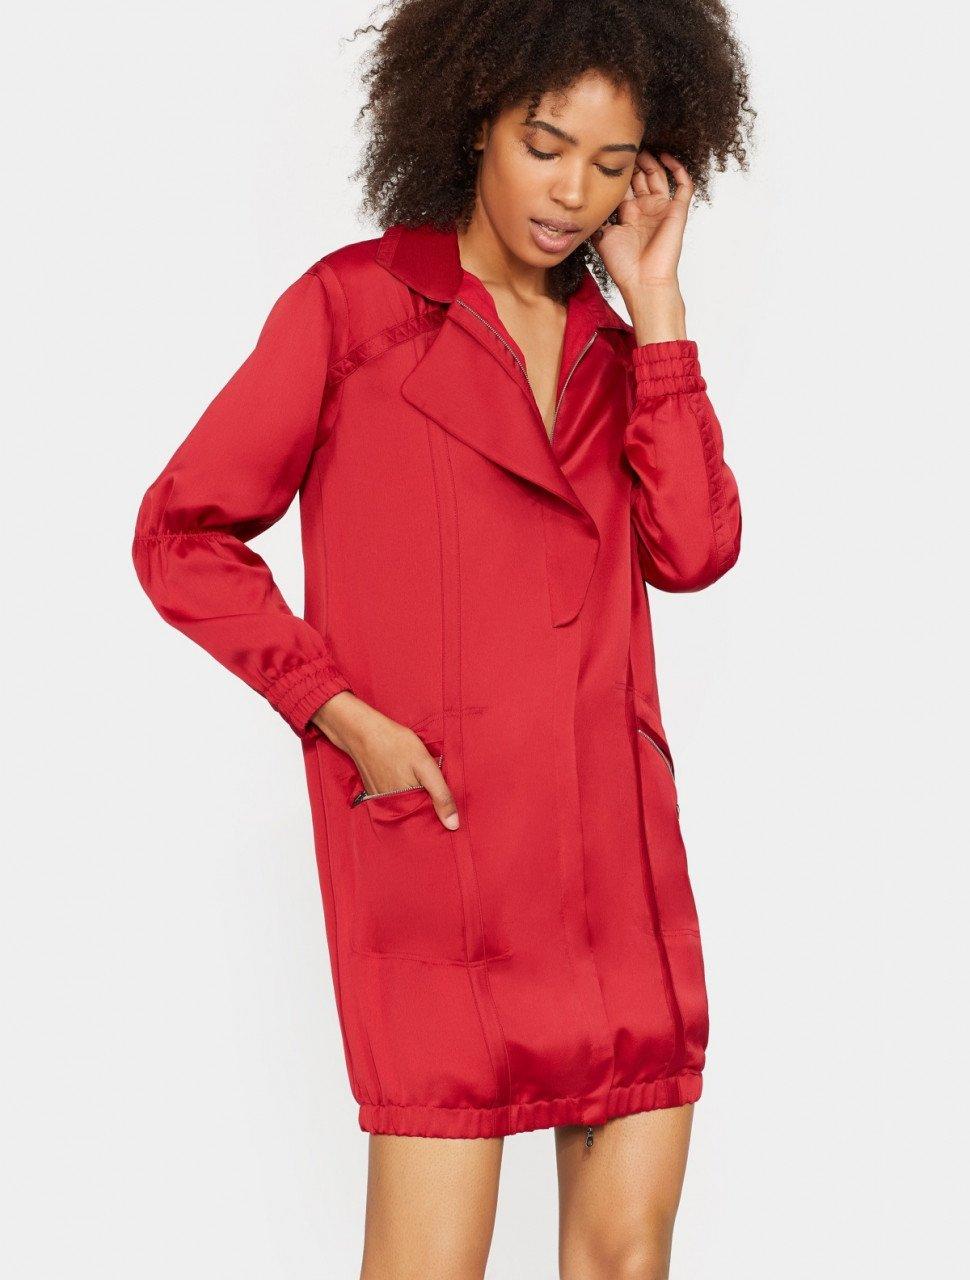 TAPE DETAIL SHIRT DRESS